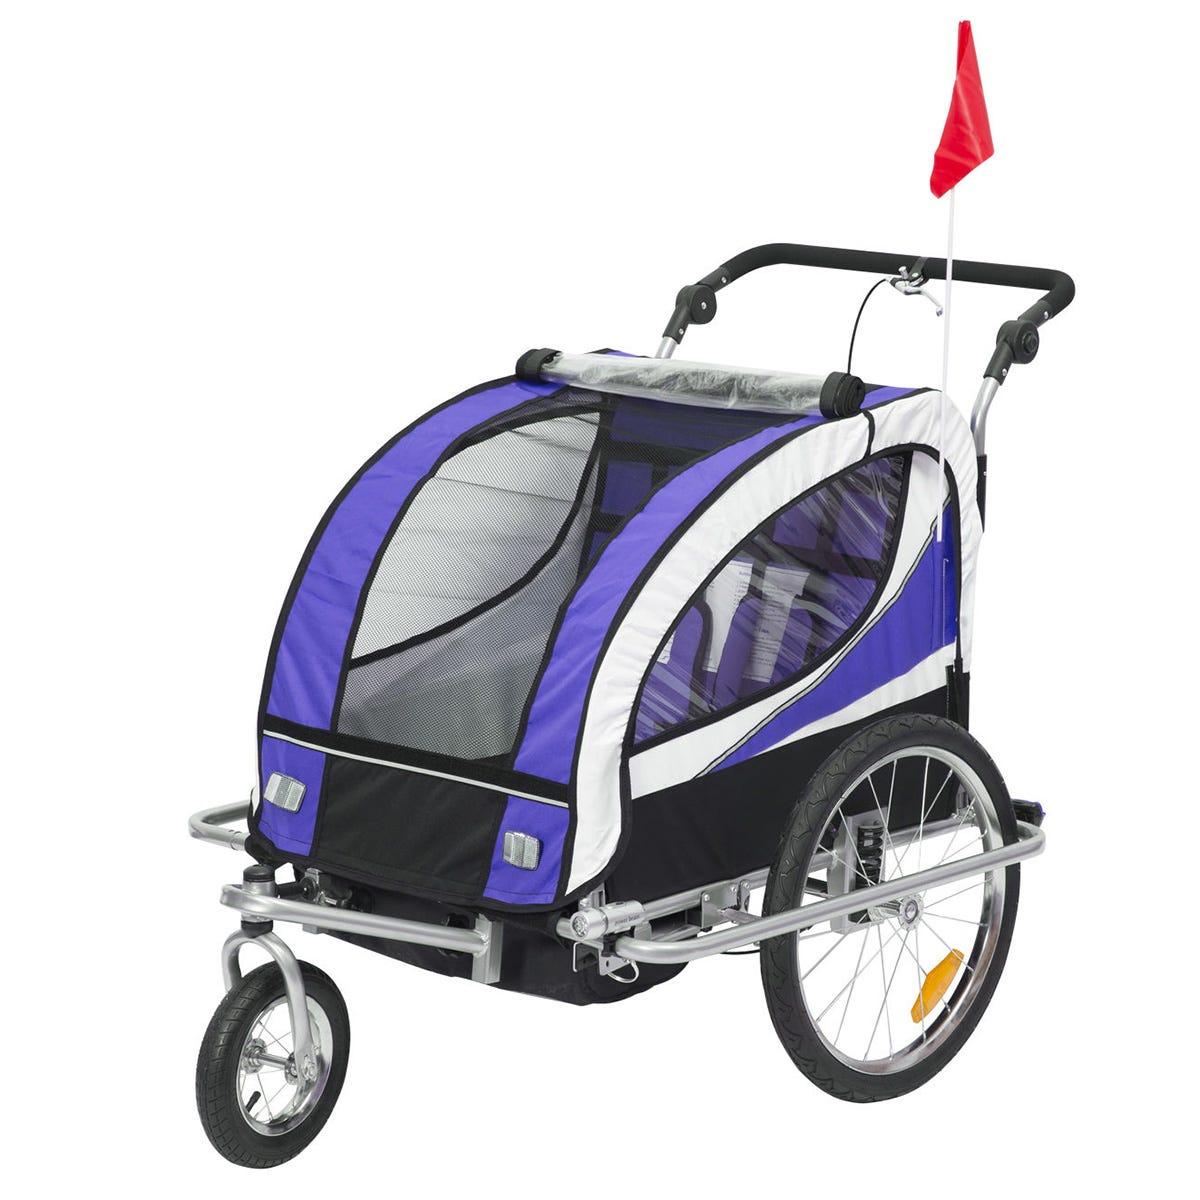 Reiten 2-in-1 Kids 2 Seater Bicycle Trailer & Stroller - Purple